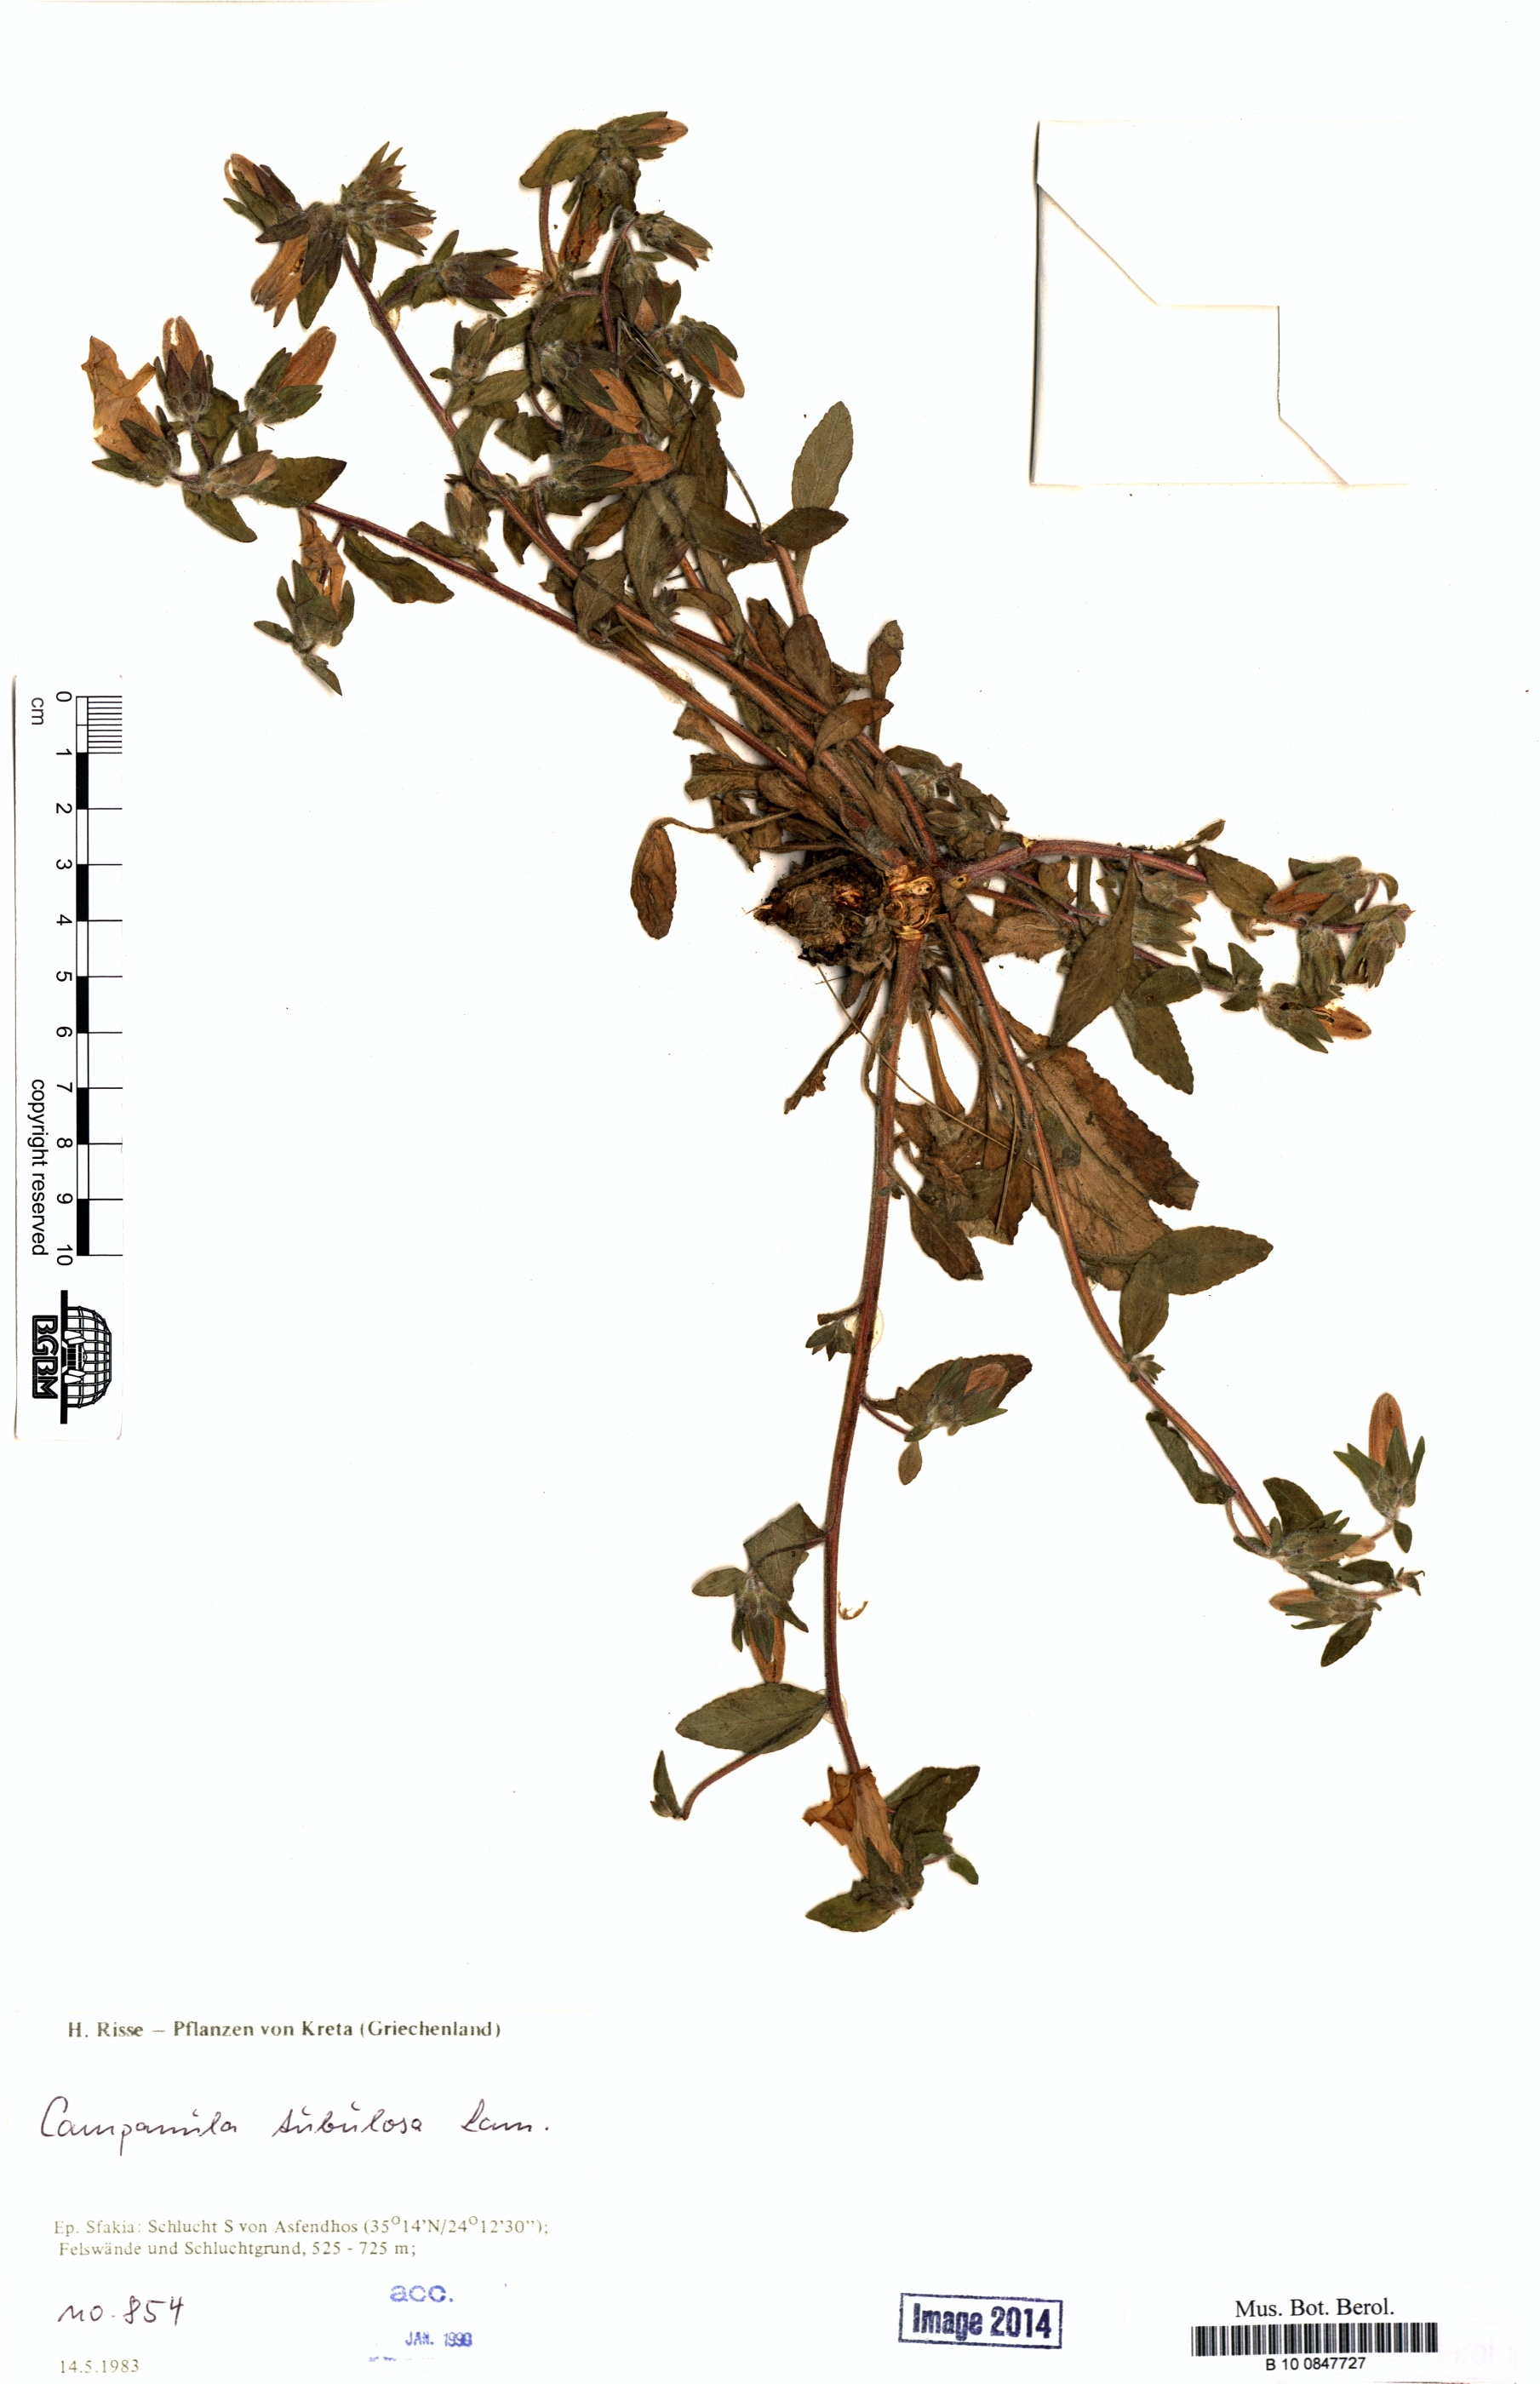 http://ww2.bgbm.org/herbarium/images/B/10/08/47/72/B_10_0847727.jpg